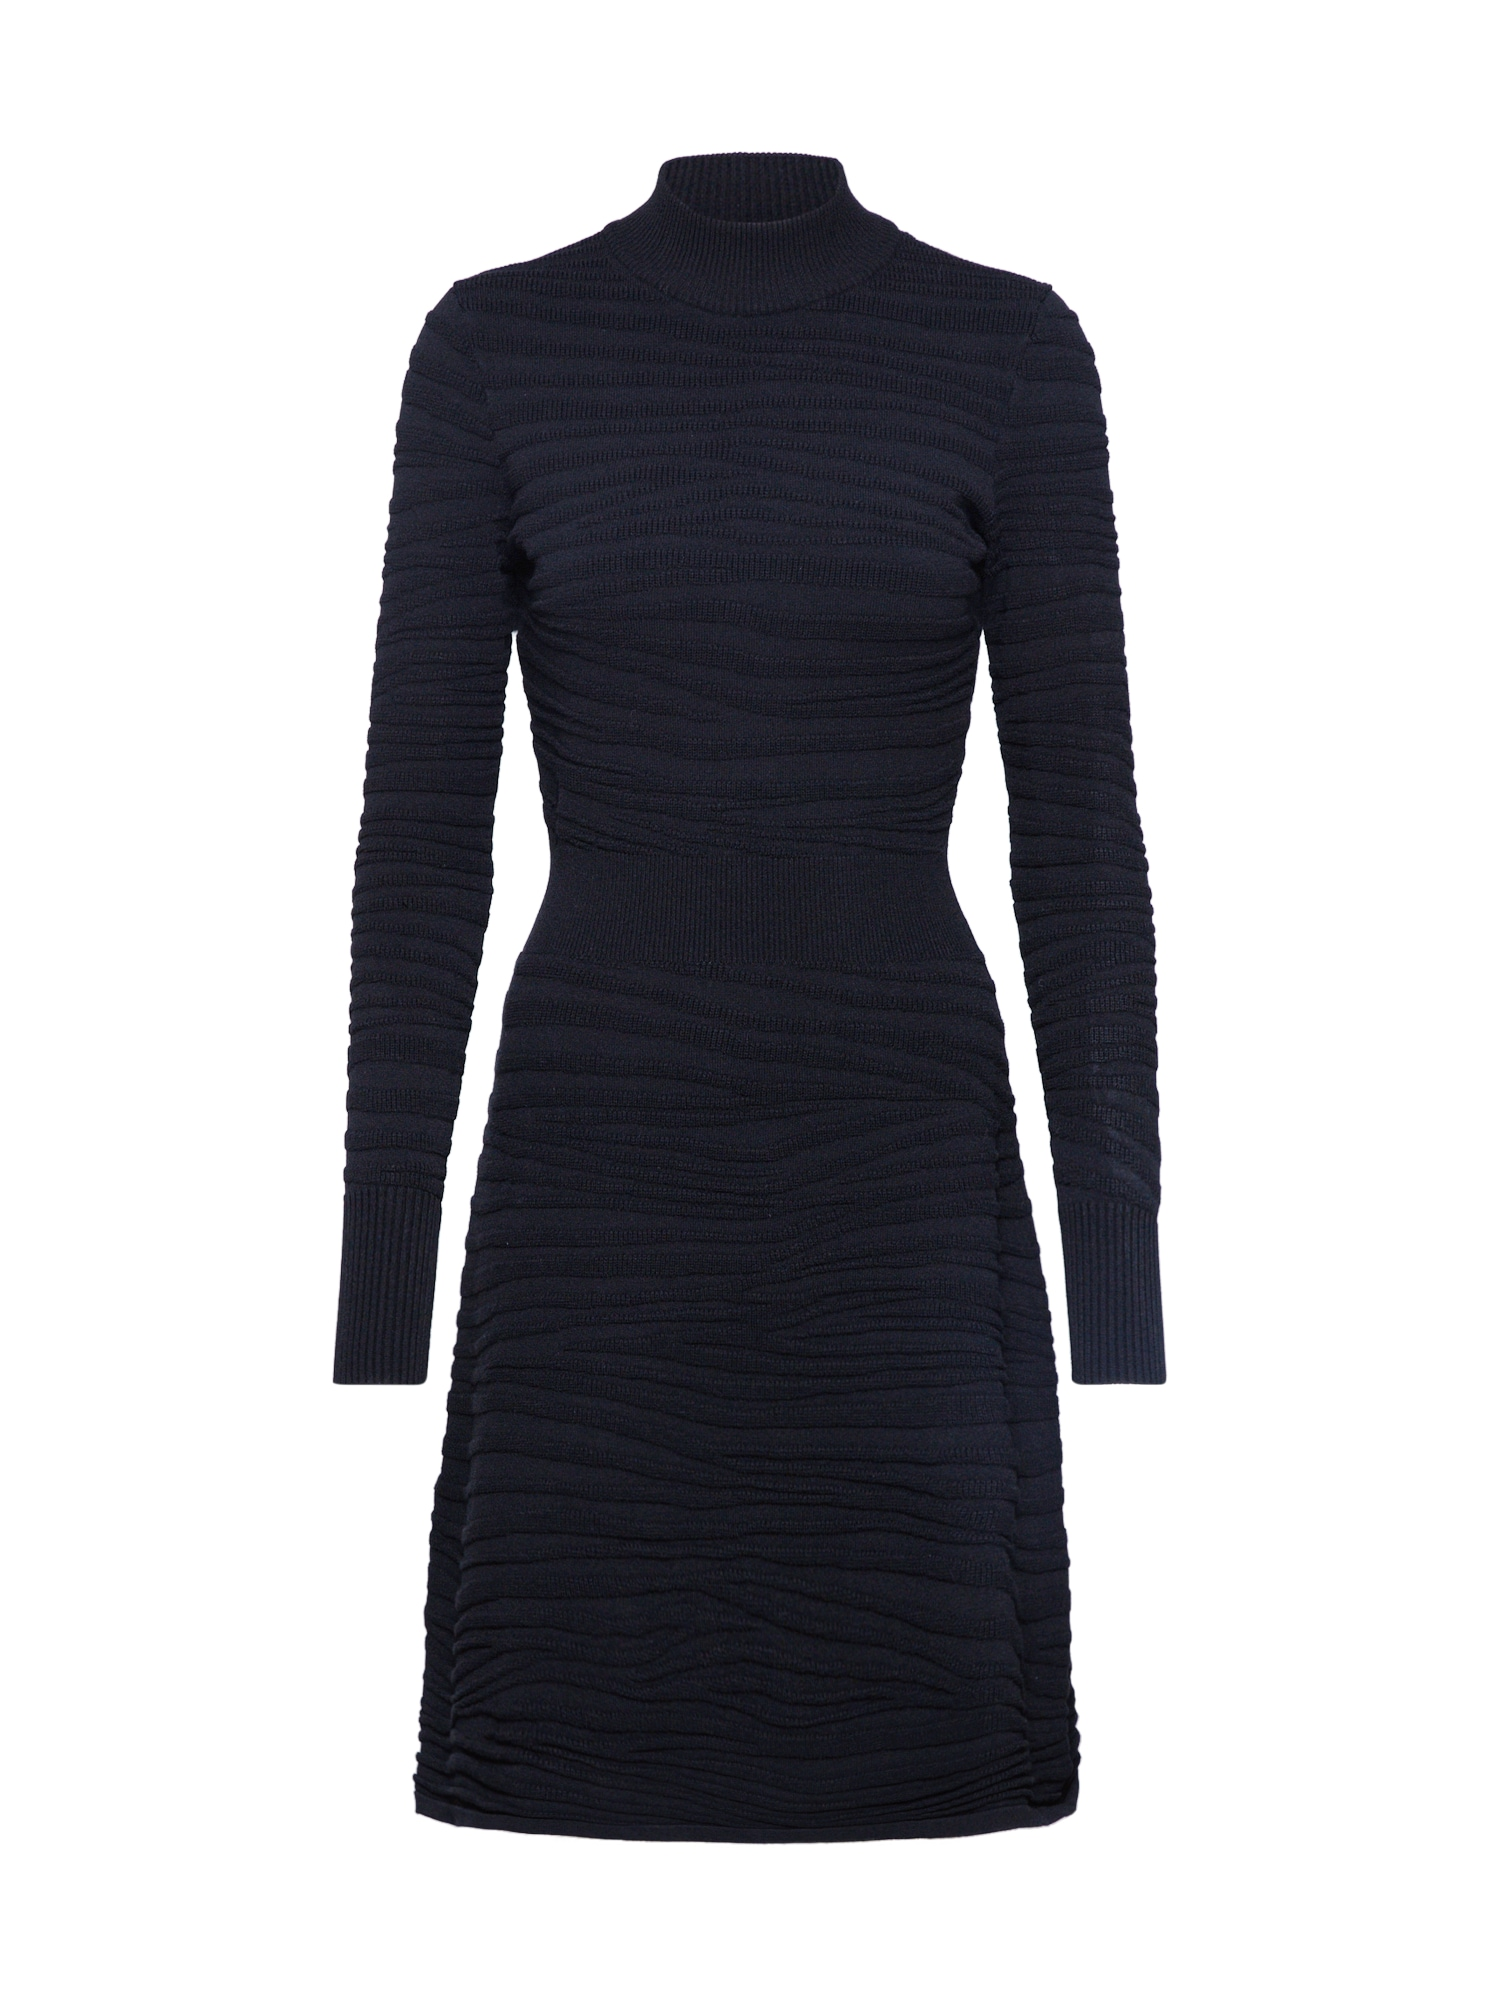 HUGO Megzta suknelė 'Sumeeya' juoda